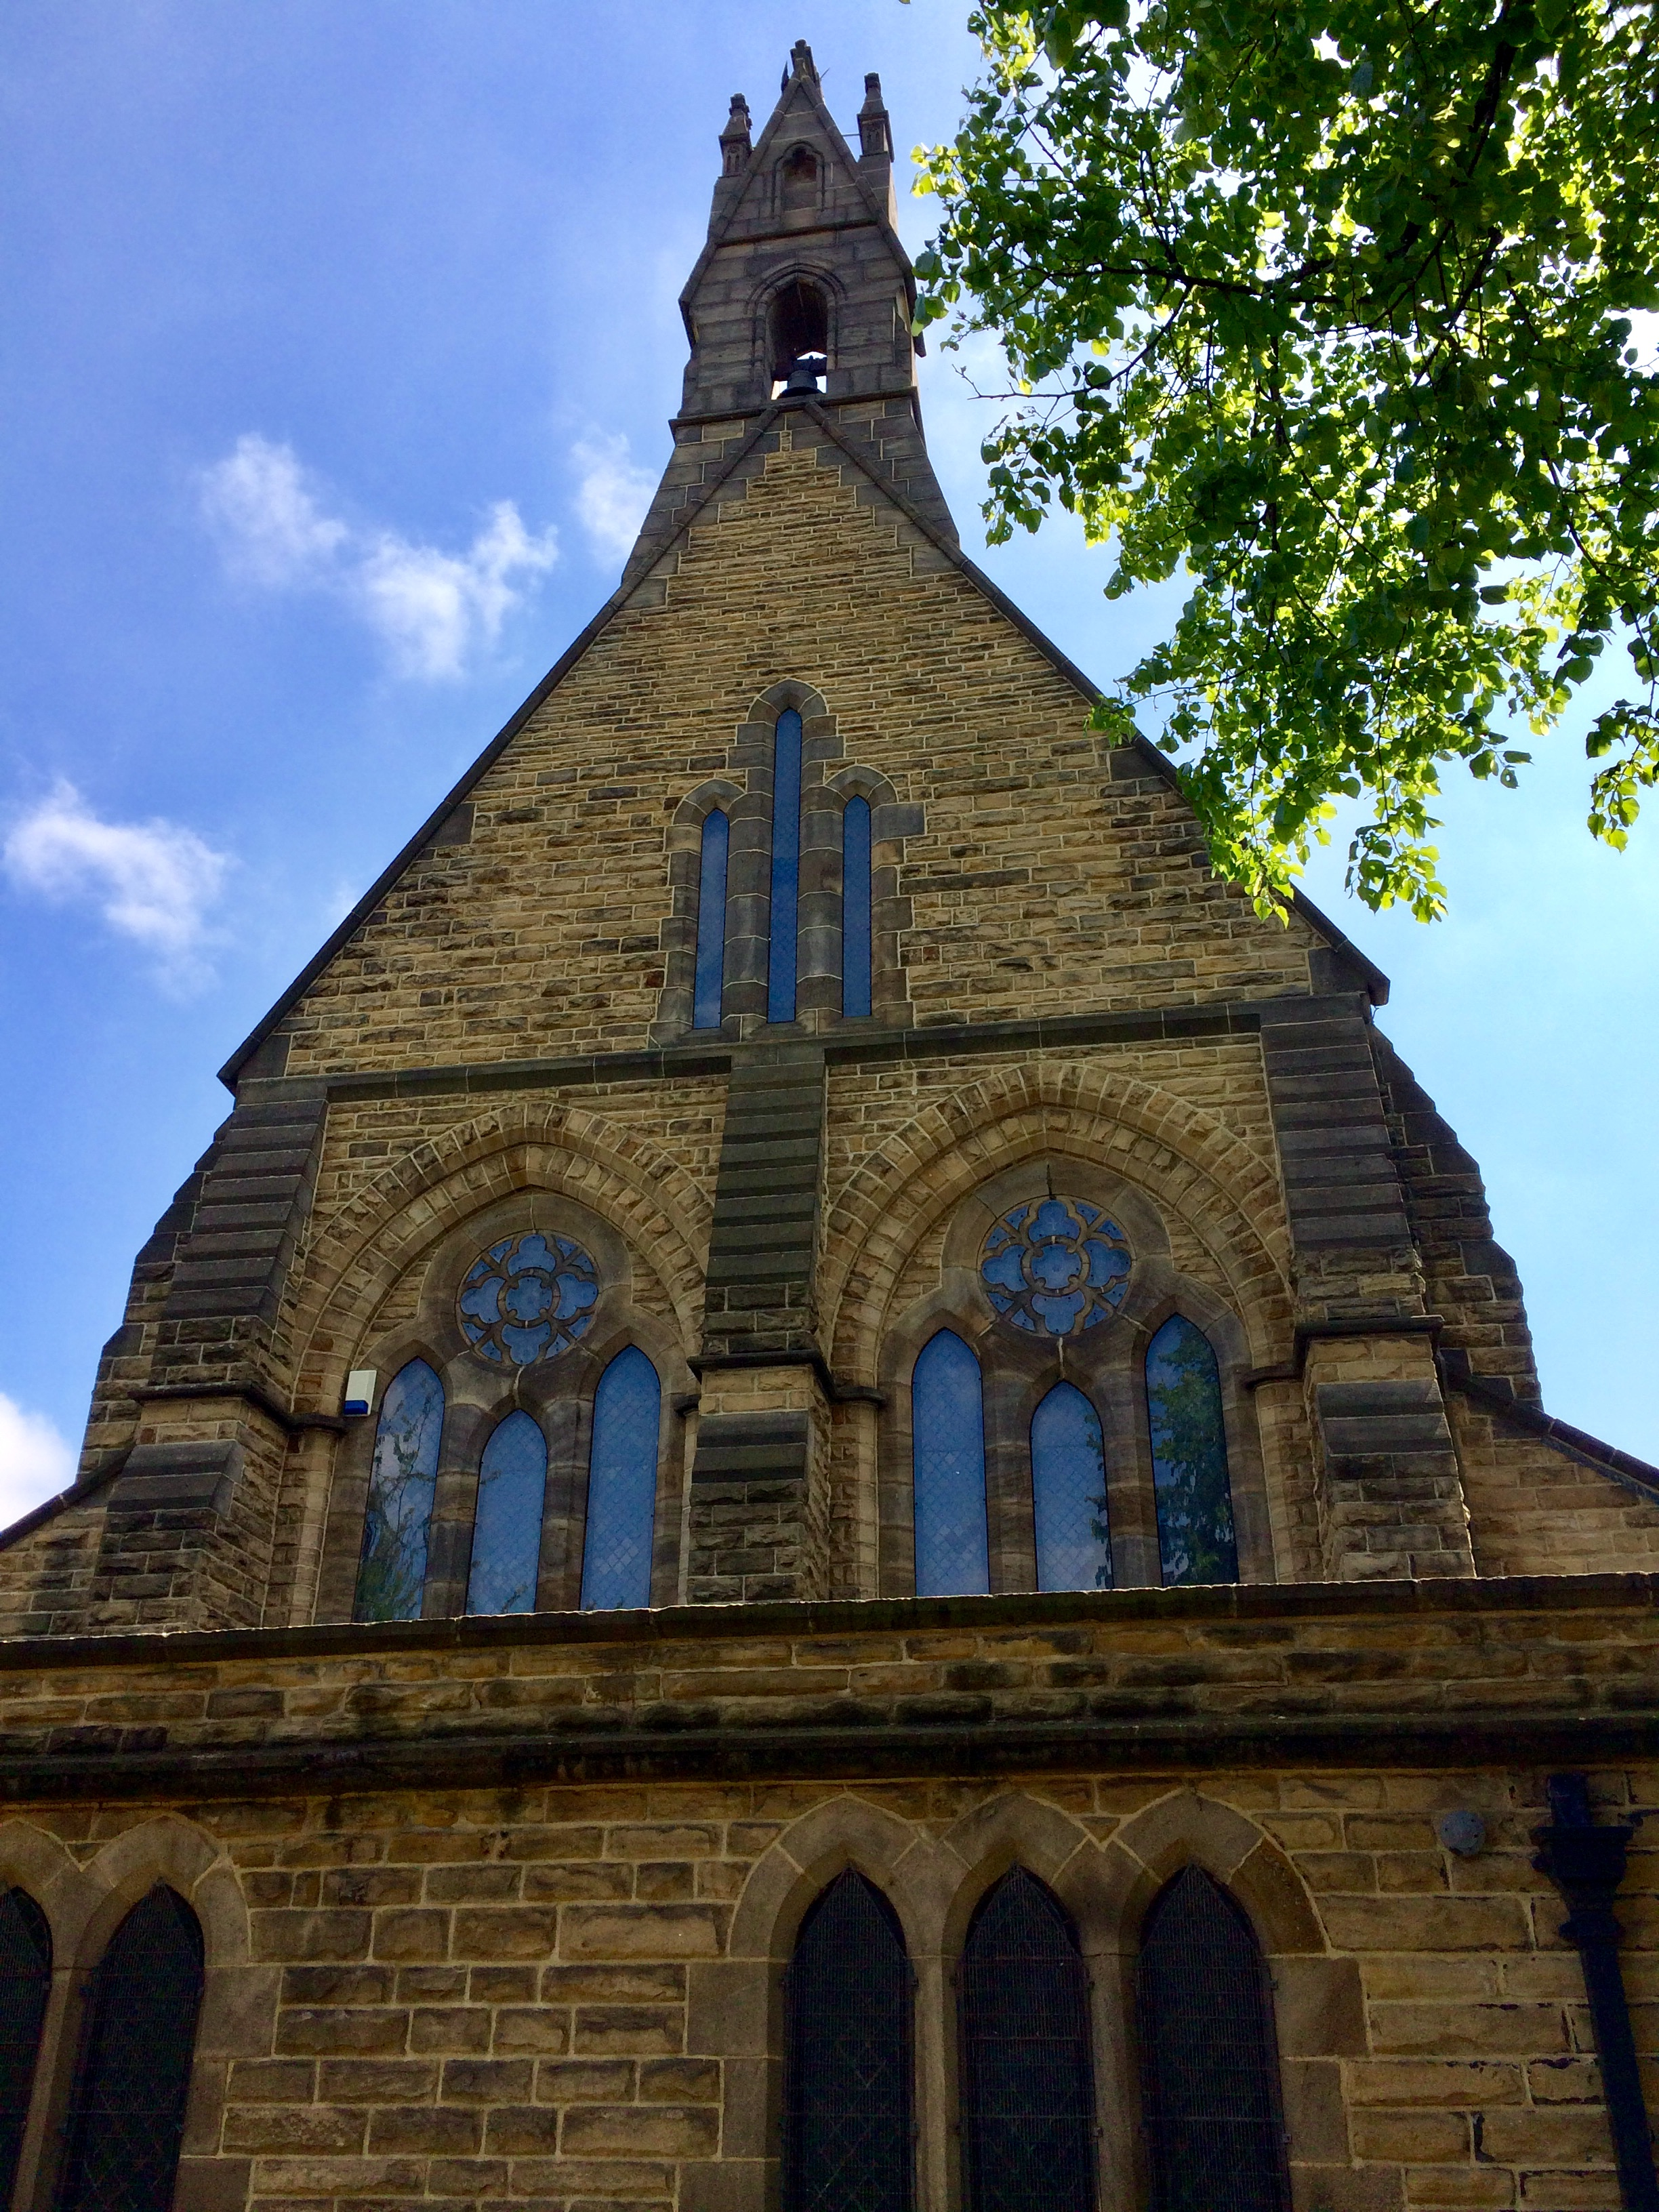 St Luke, Holbeck, Yorkshire (c) MUST CREDIT DANNY MURPHY